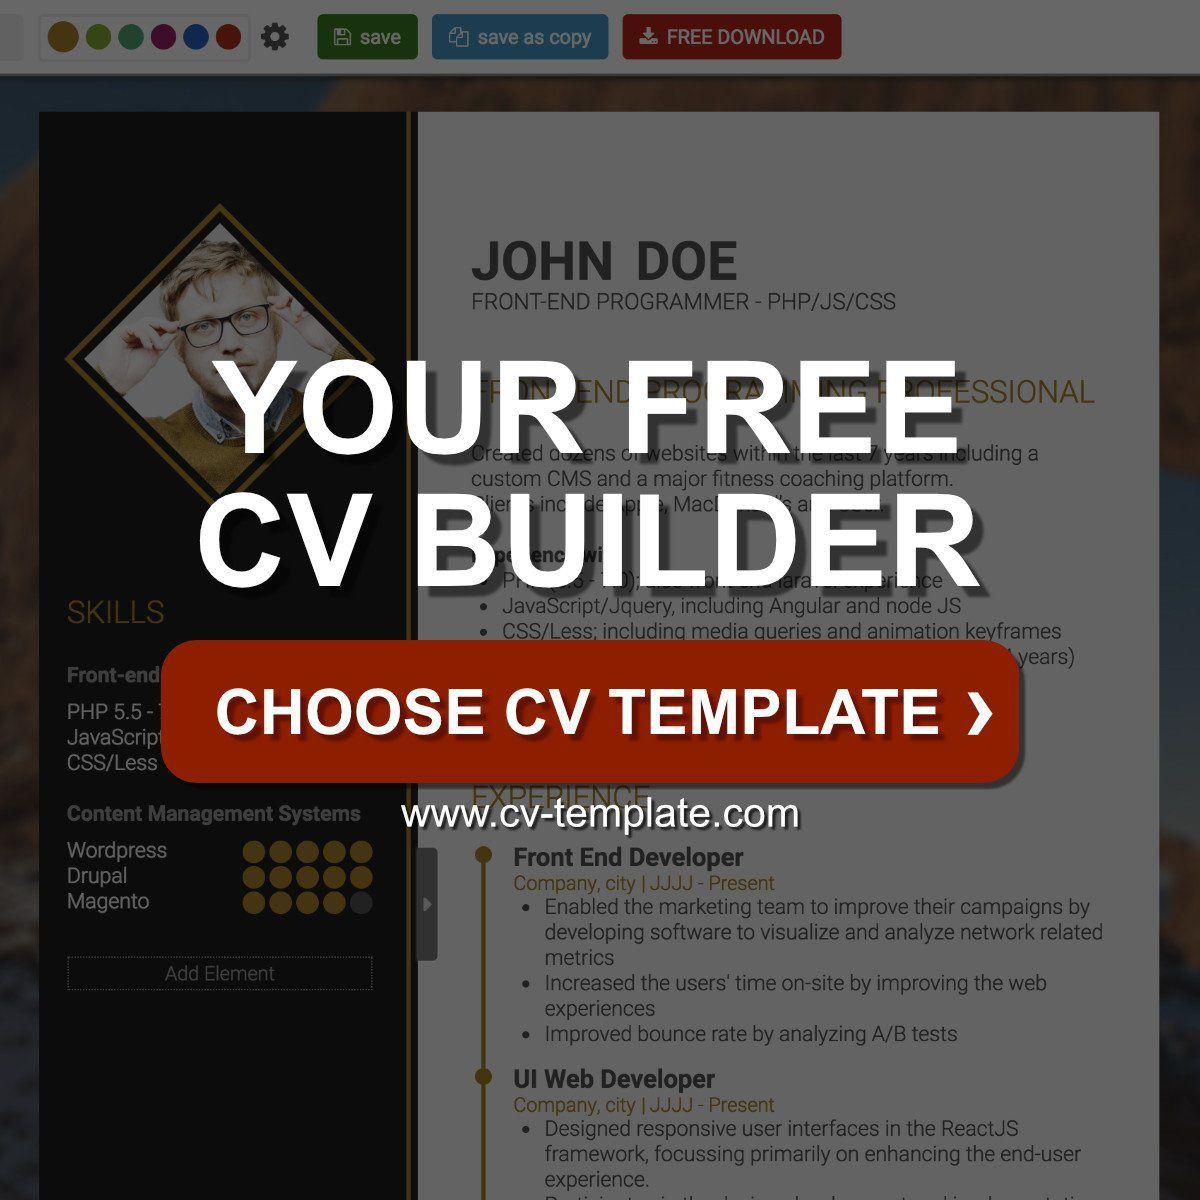 004 Shocking Professional Cv Template Free Online Photo  ResumeFull